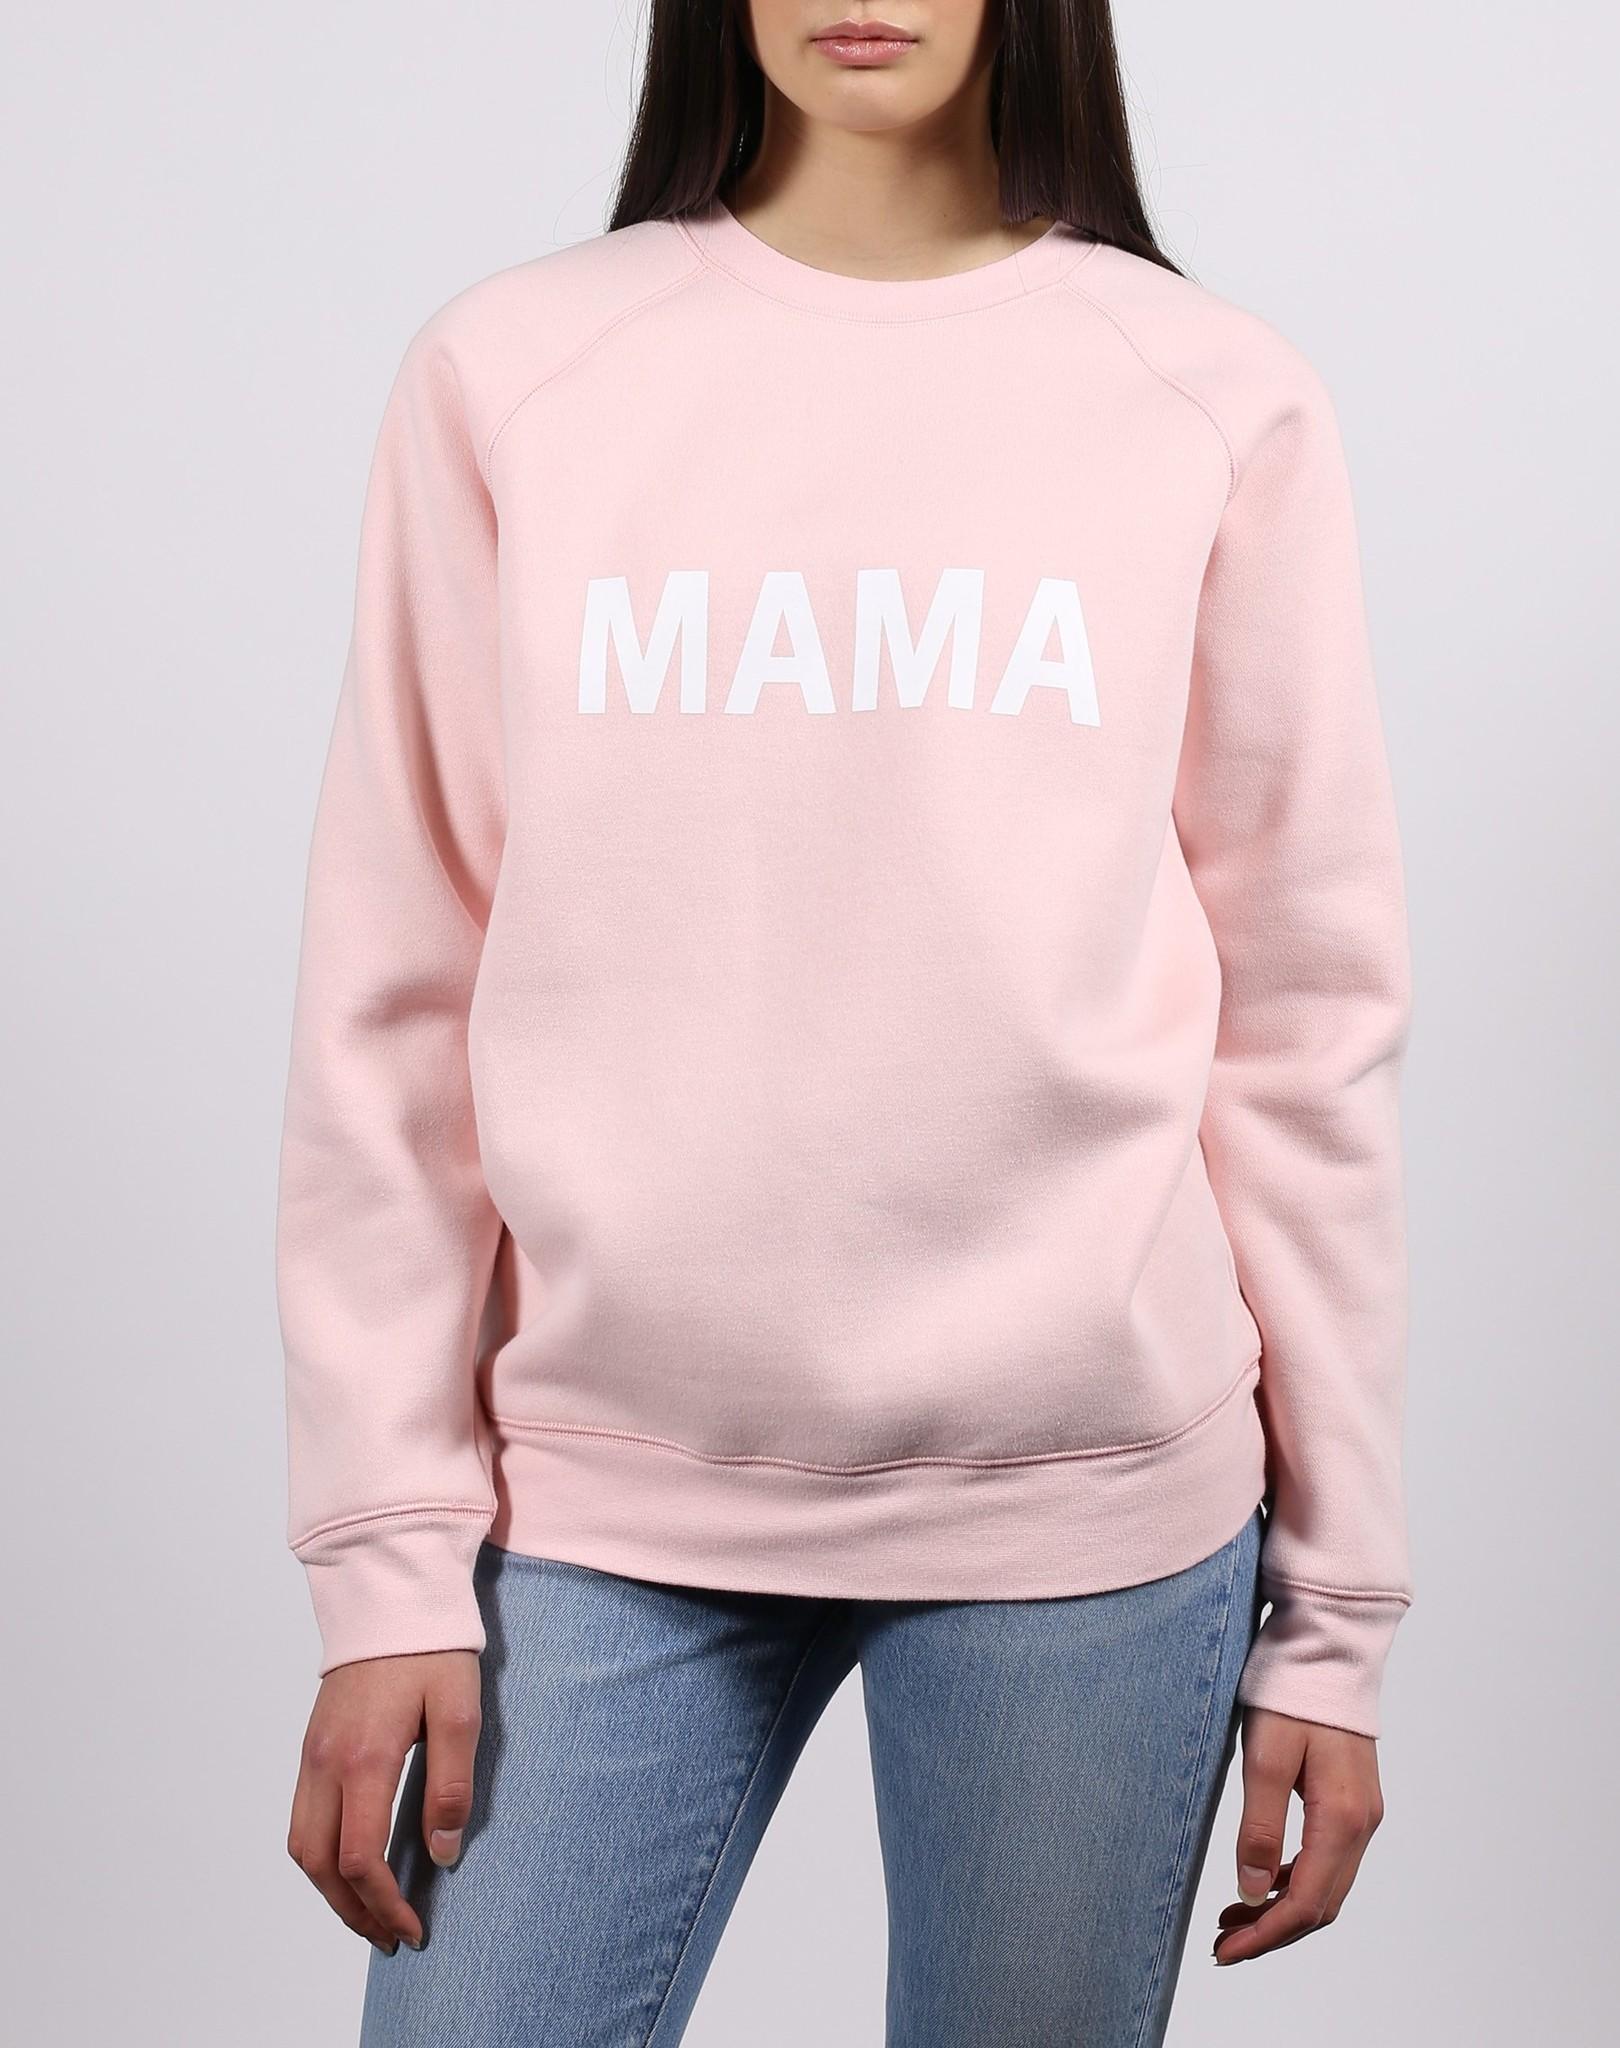 Mama Crew BPNK-2